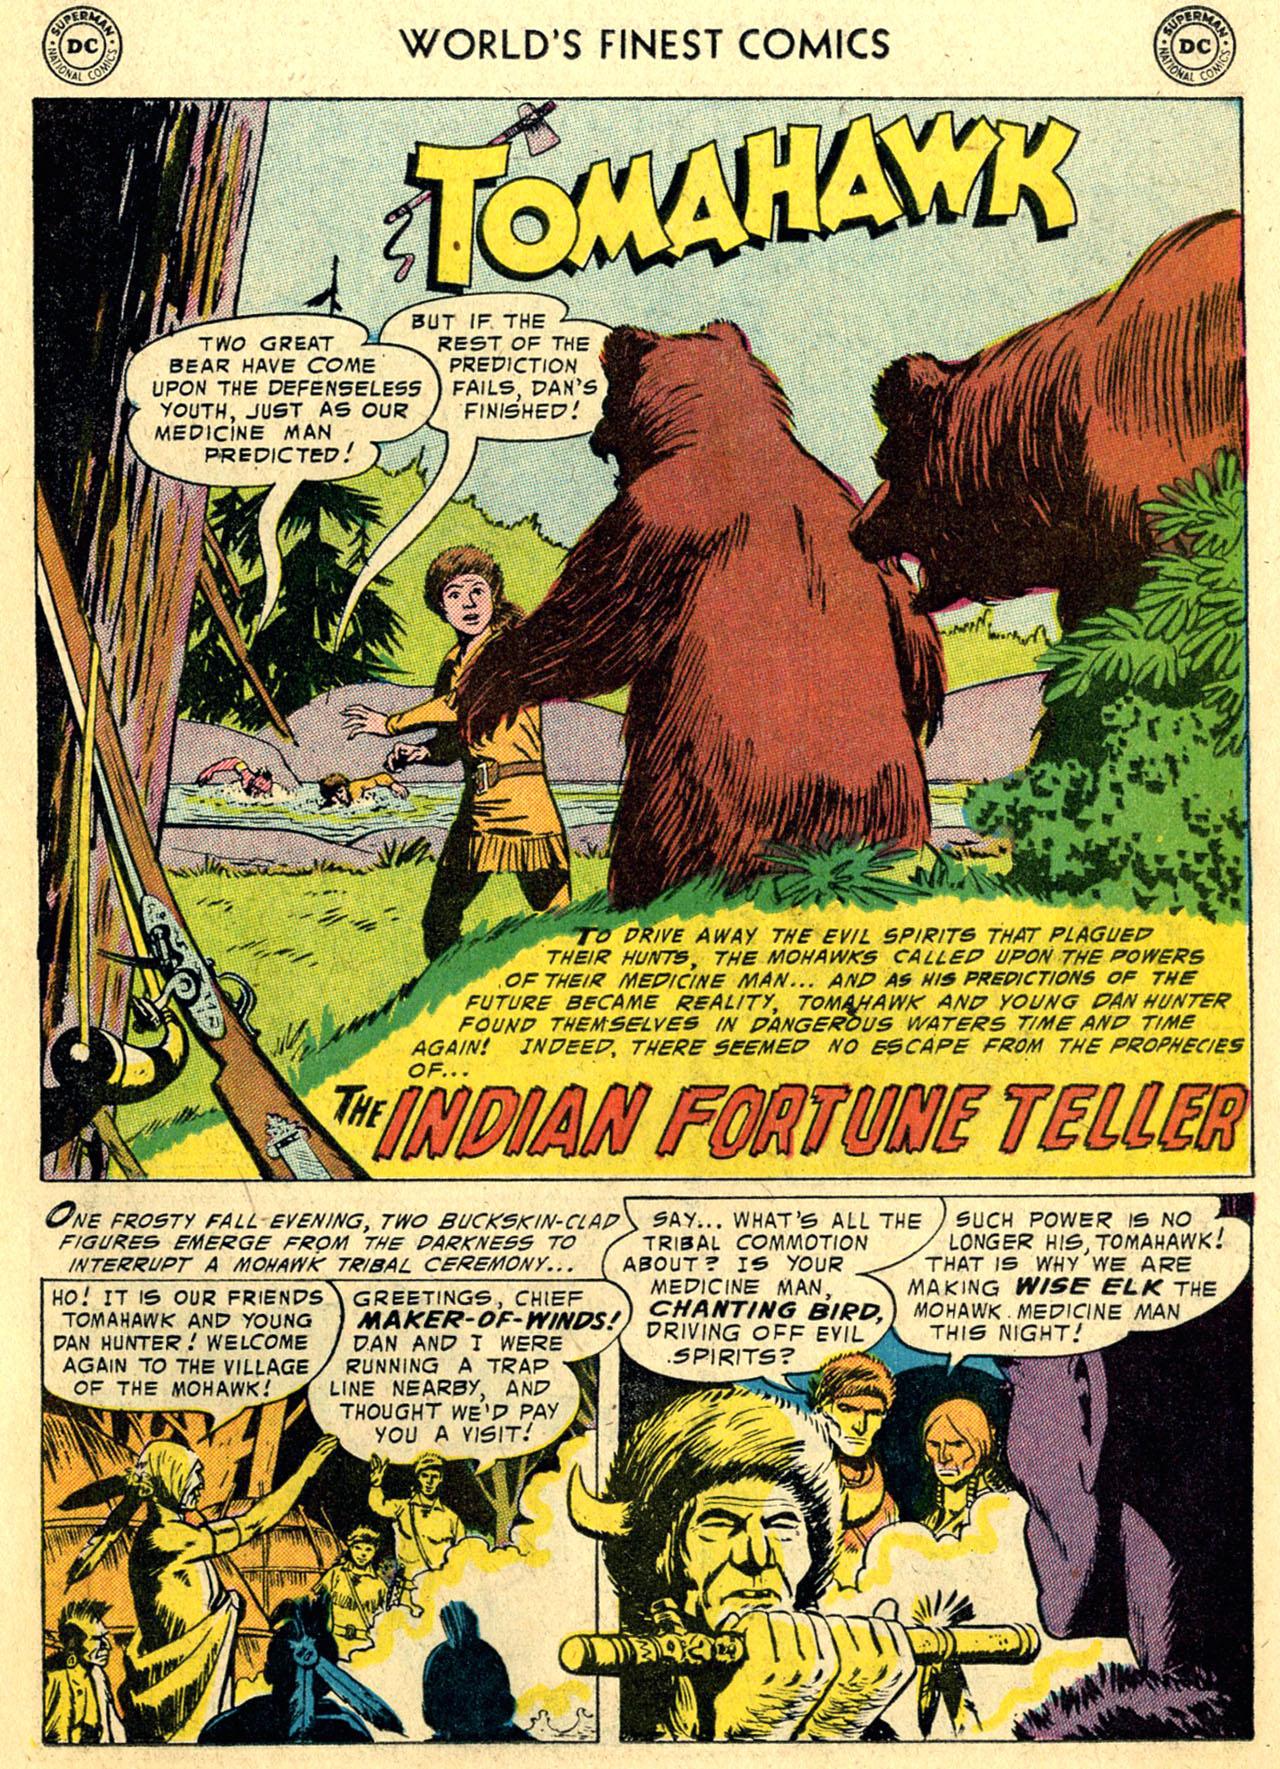 Read online World's Finest Comics comic -  Issue #82 - 15